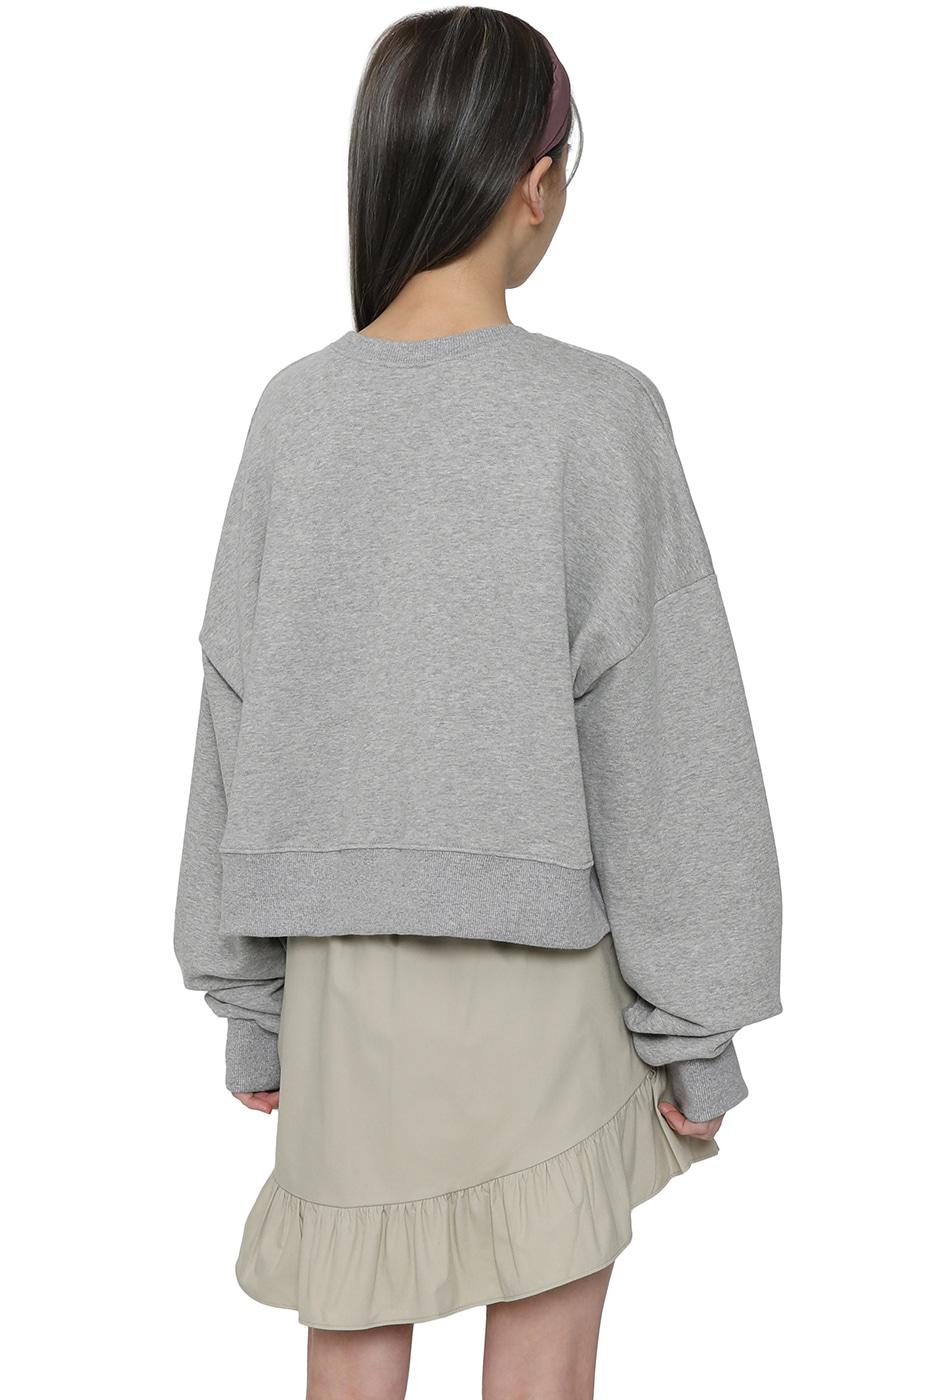 Denny cropped crew neck sweatshirt